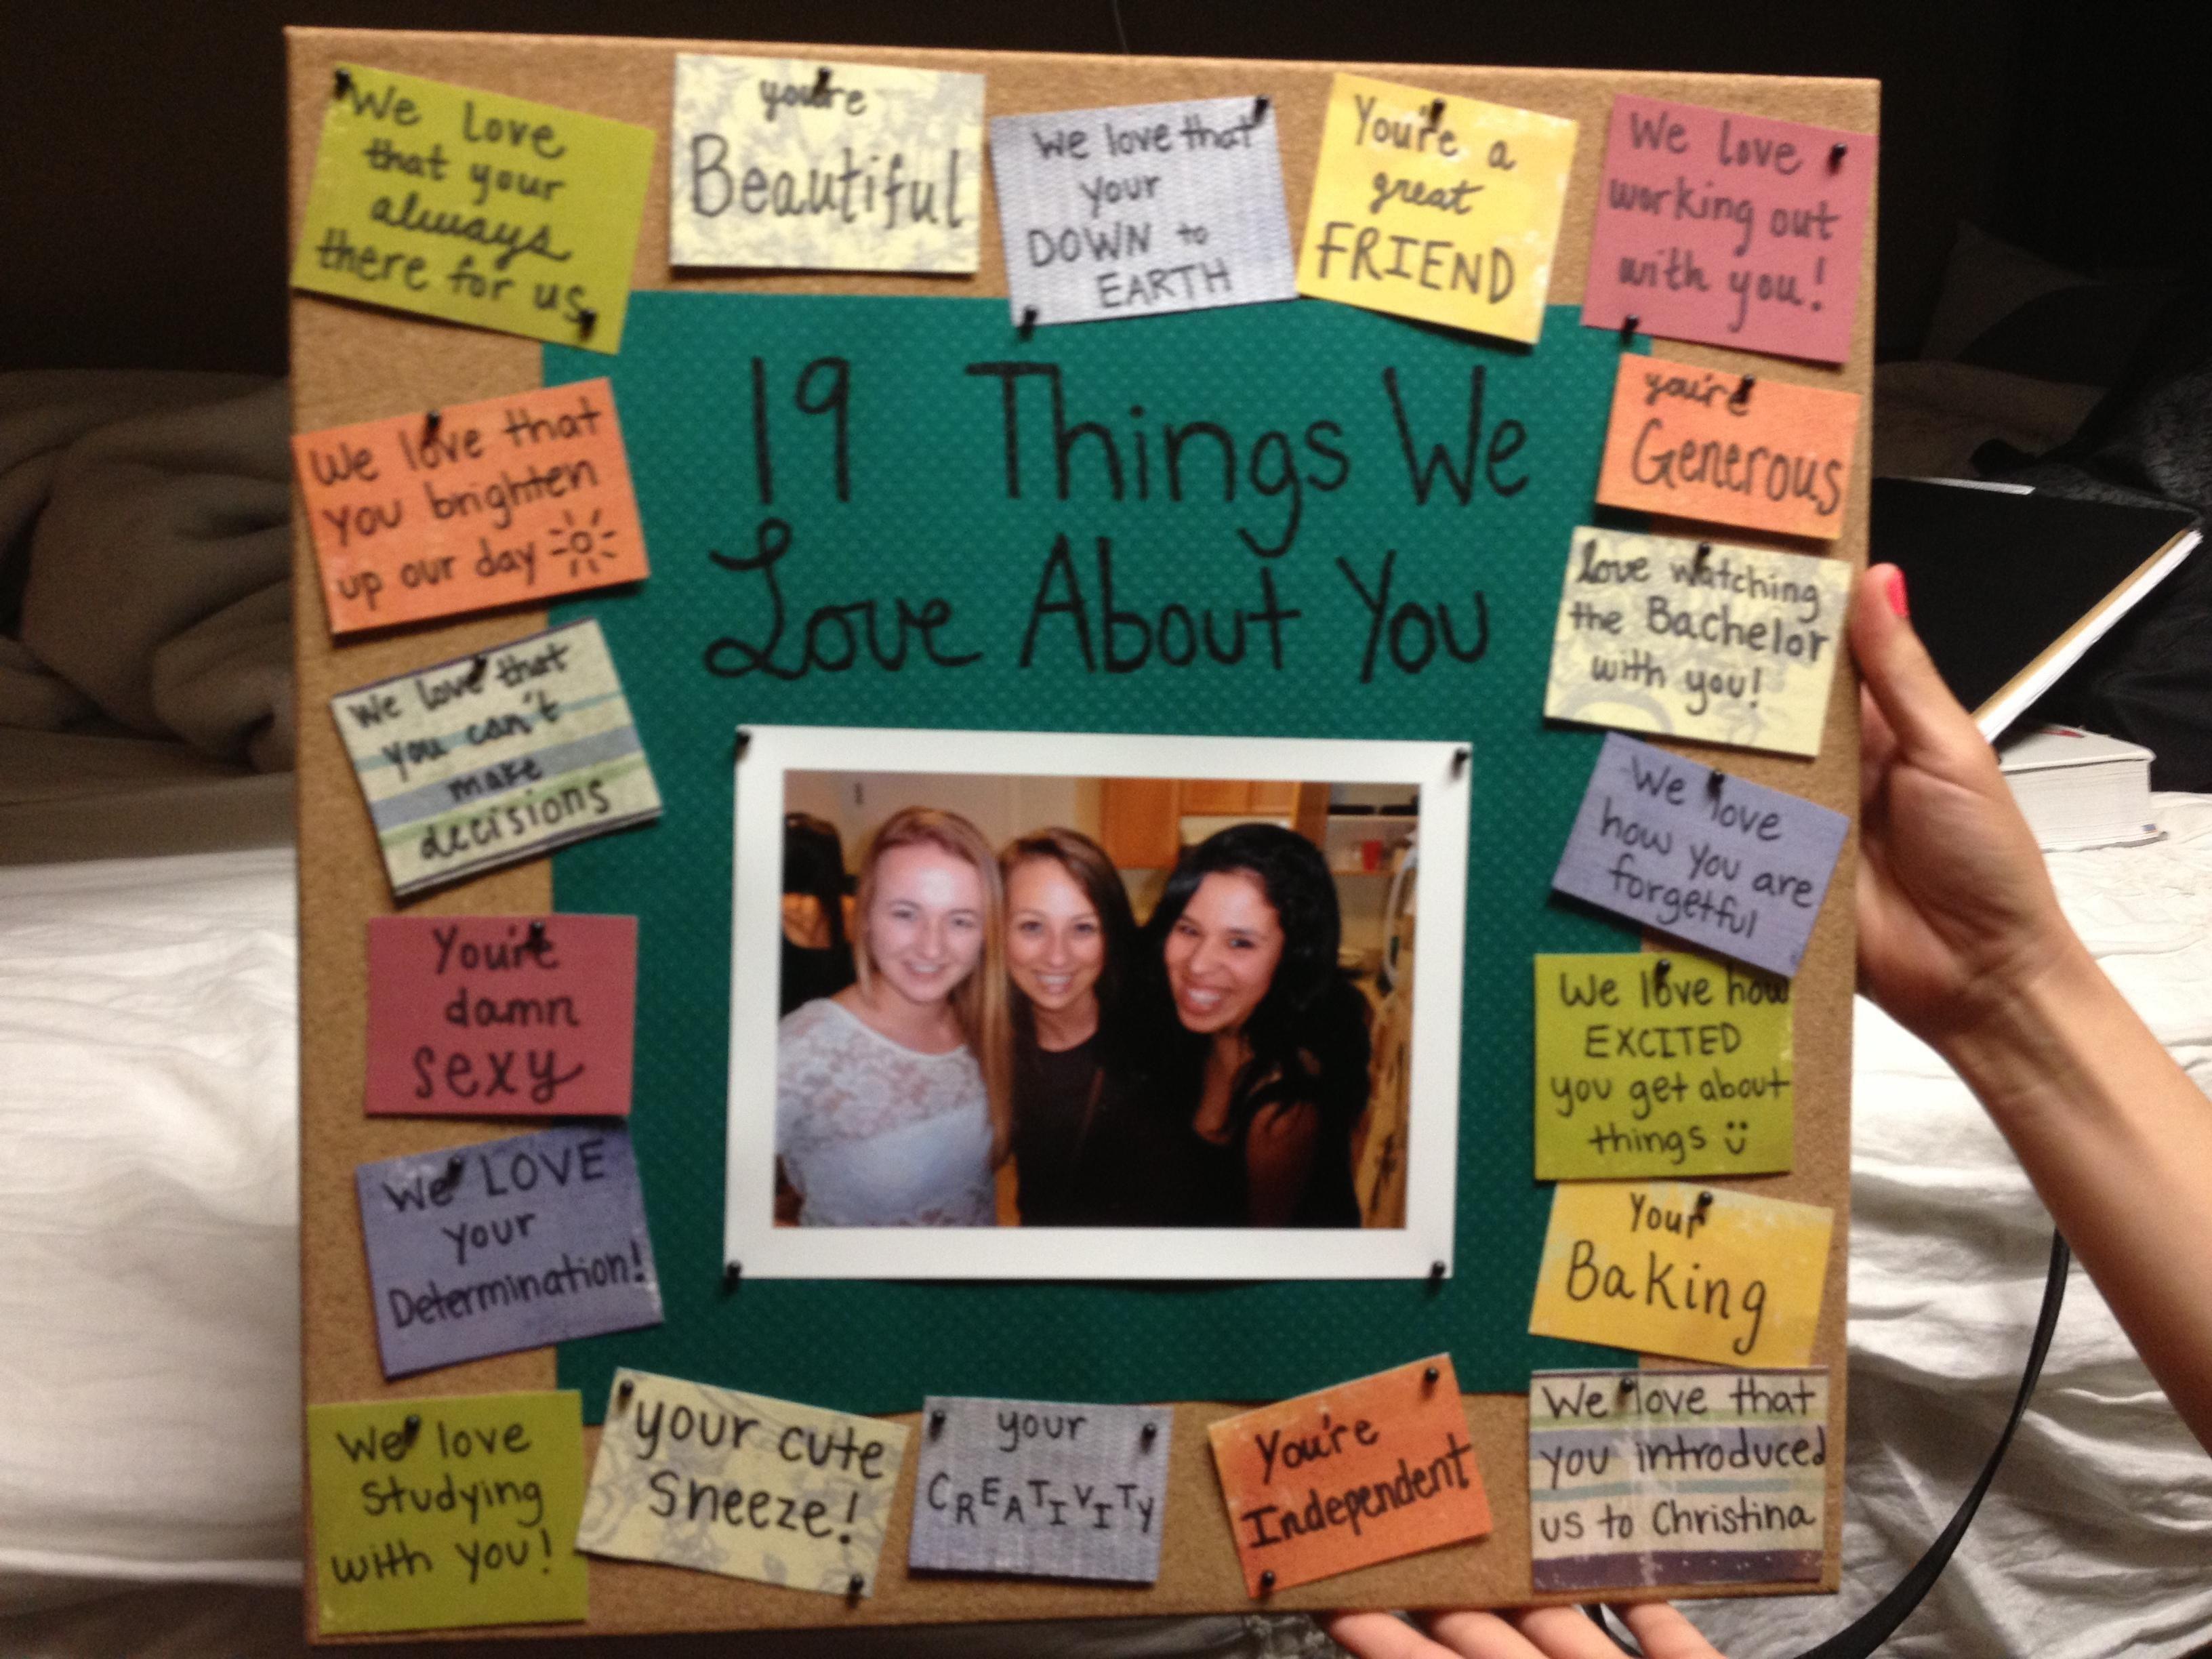 Birthday Gifts For Girl Best Friend  Birthday Gift Ideas for Your Best Friend Girlfriend or